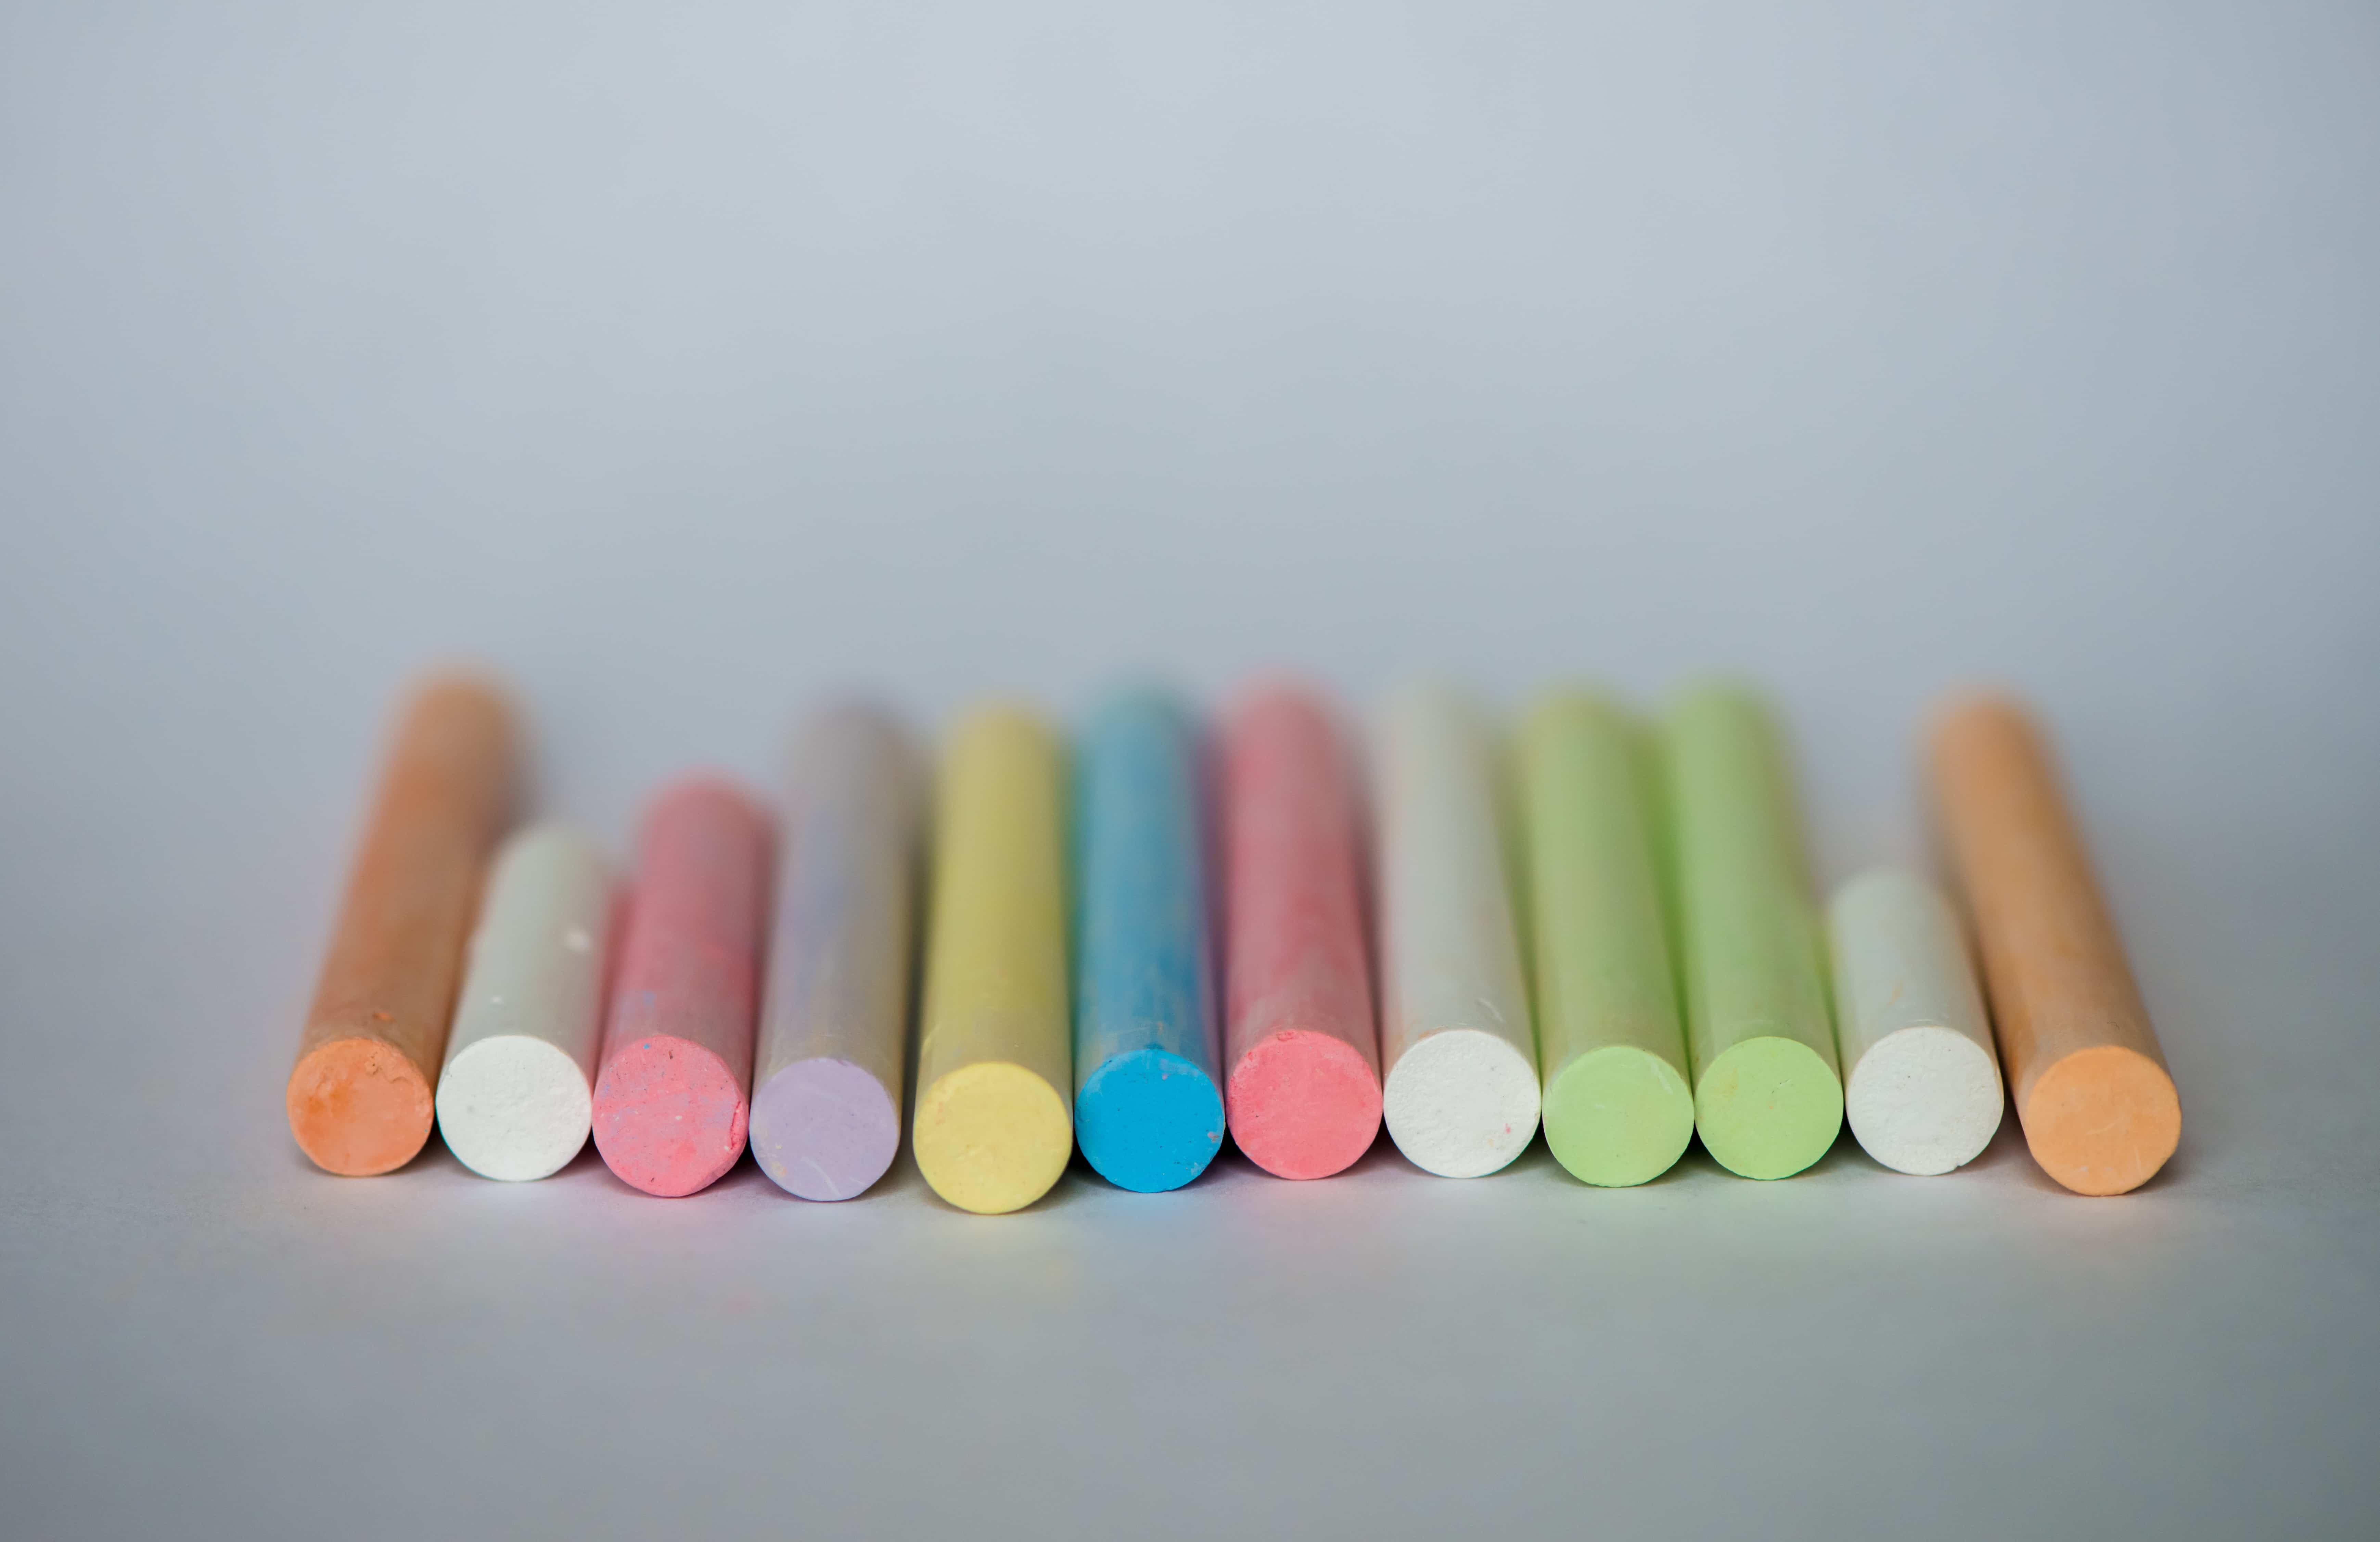 Ahorrar en material escolar - Tizas de colores